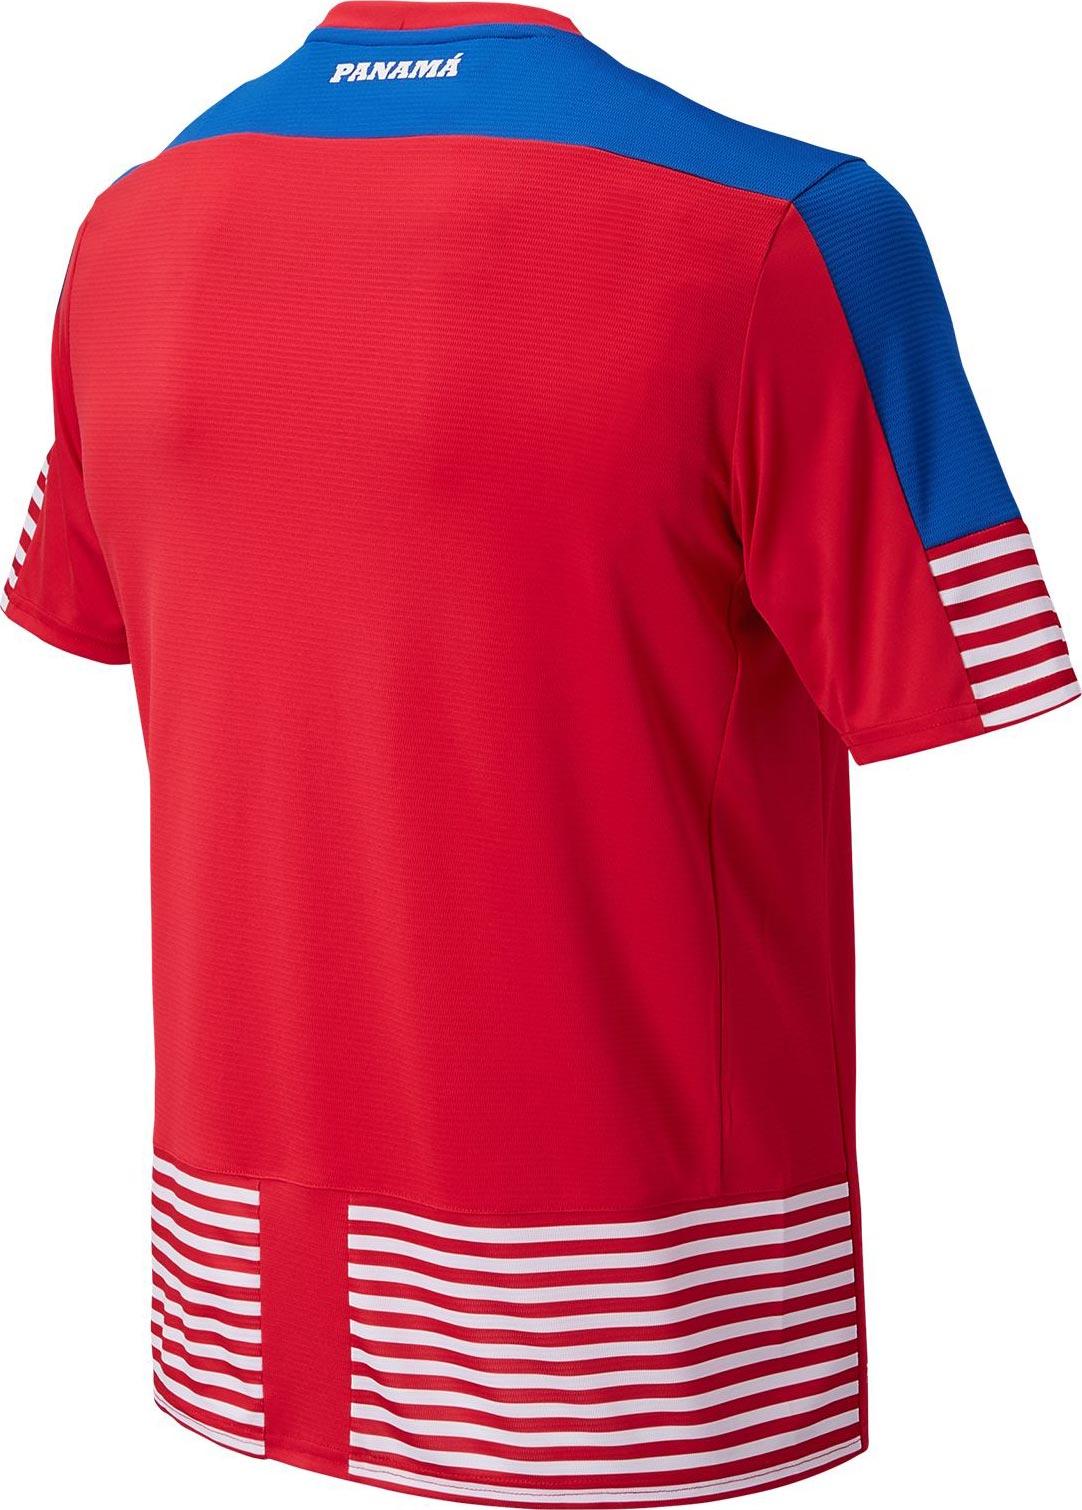 panama-2018-world-cup-qualifiers-kits-back